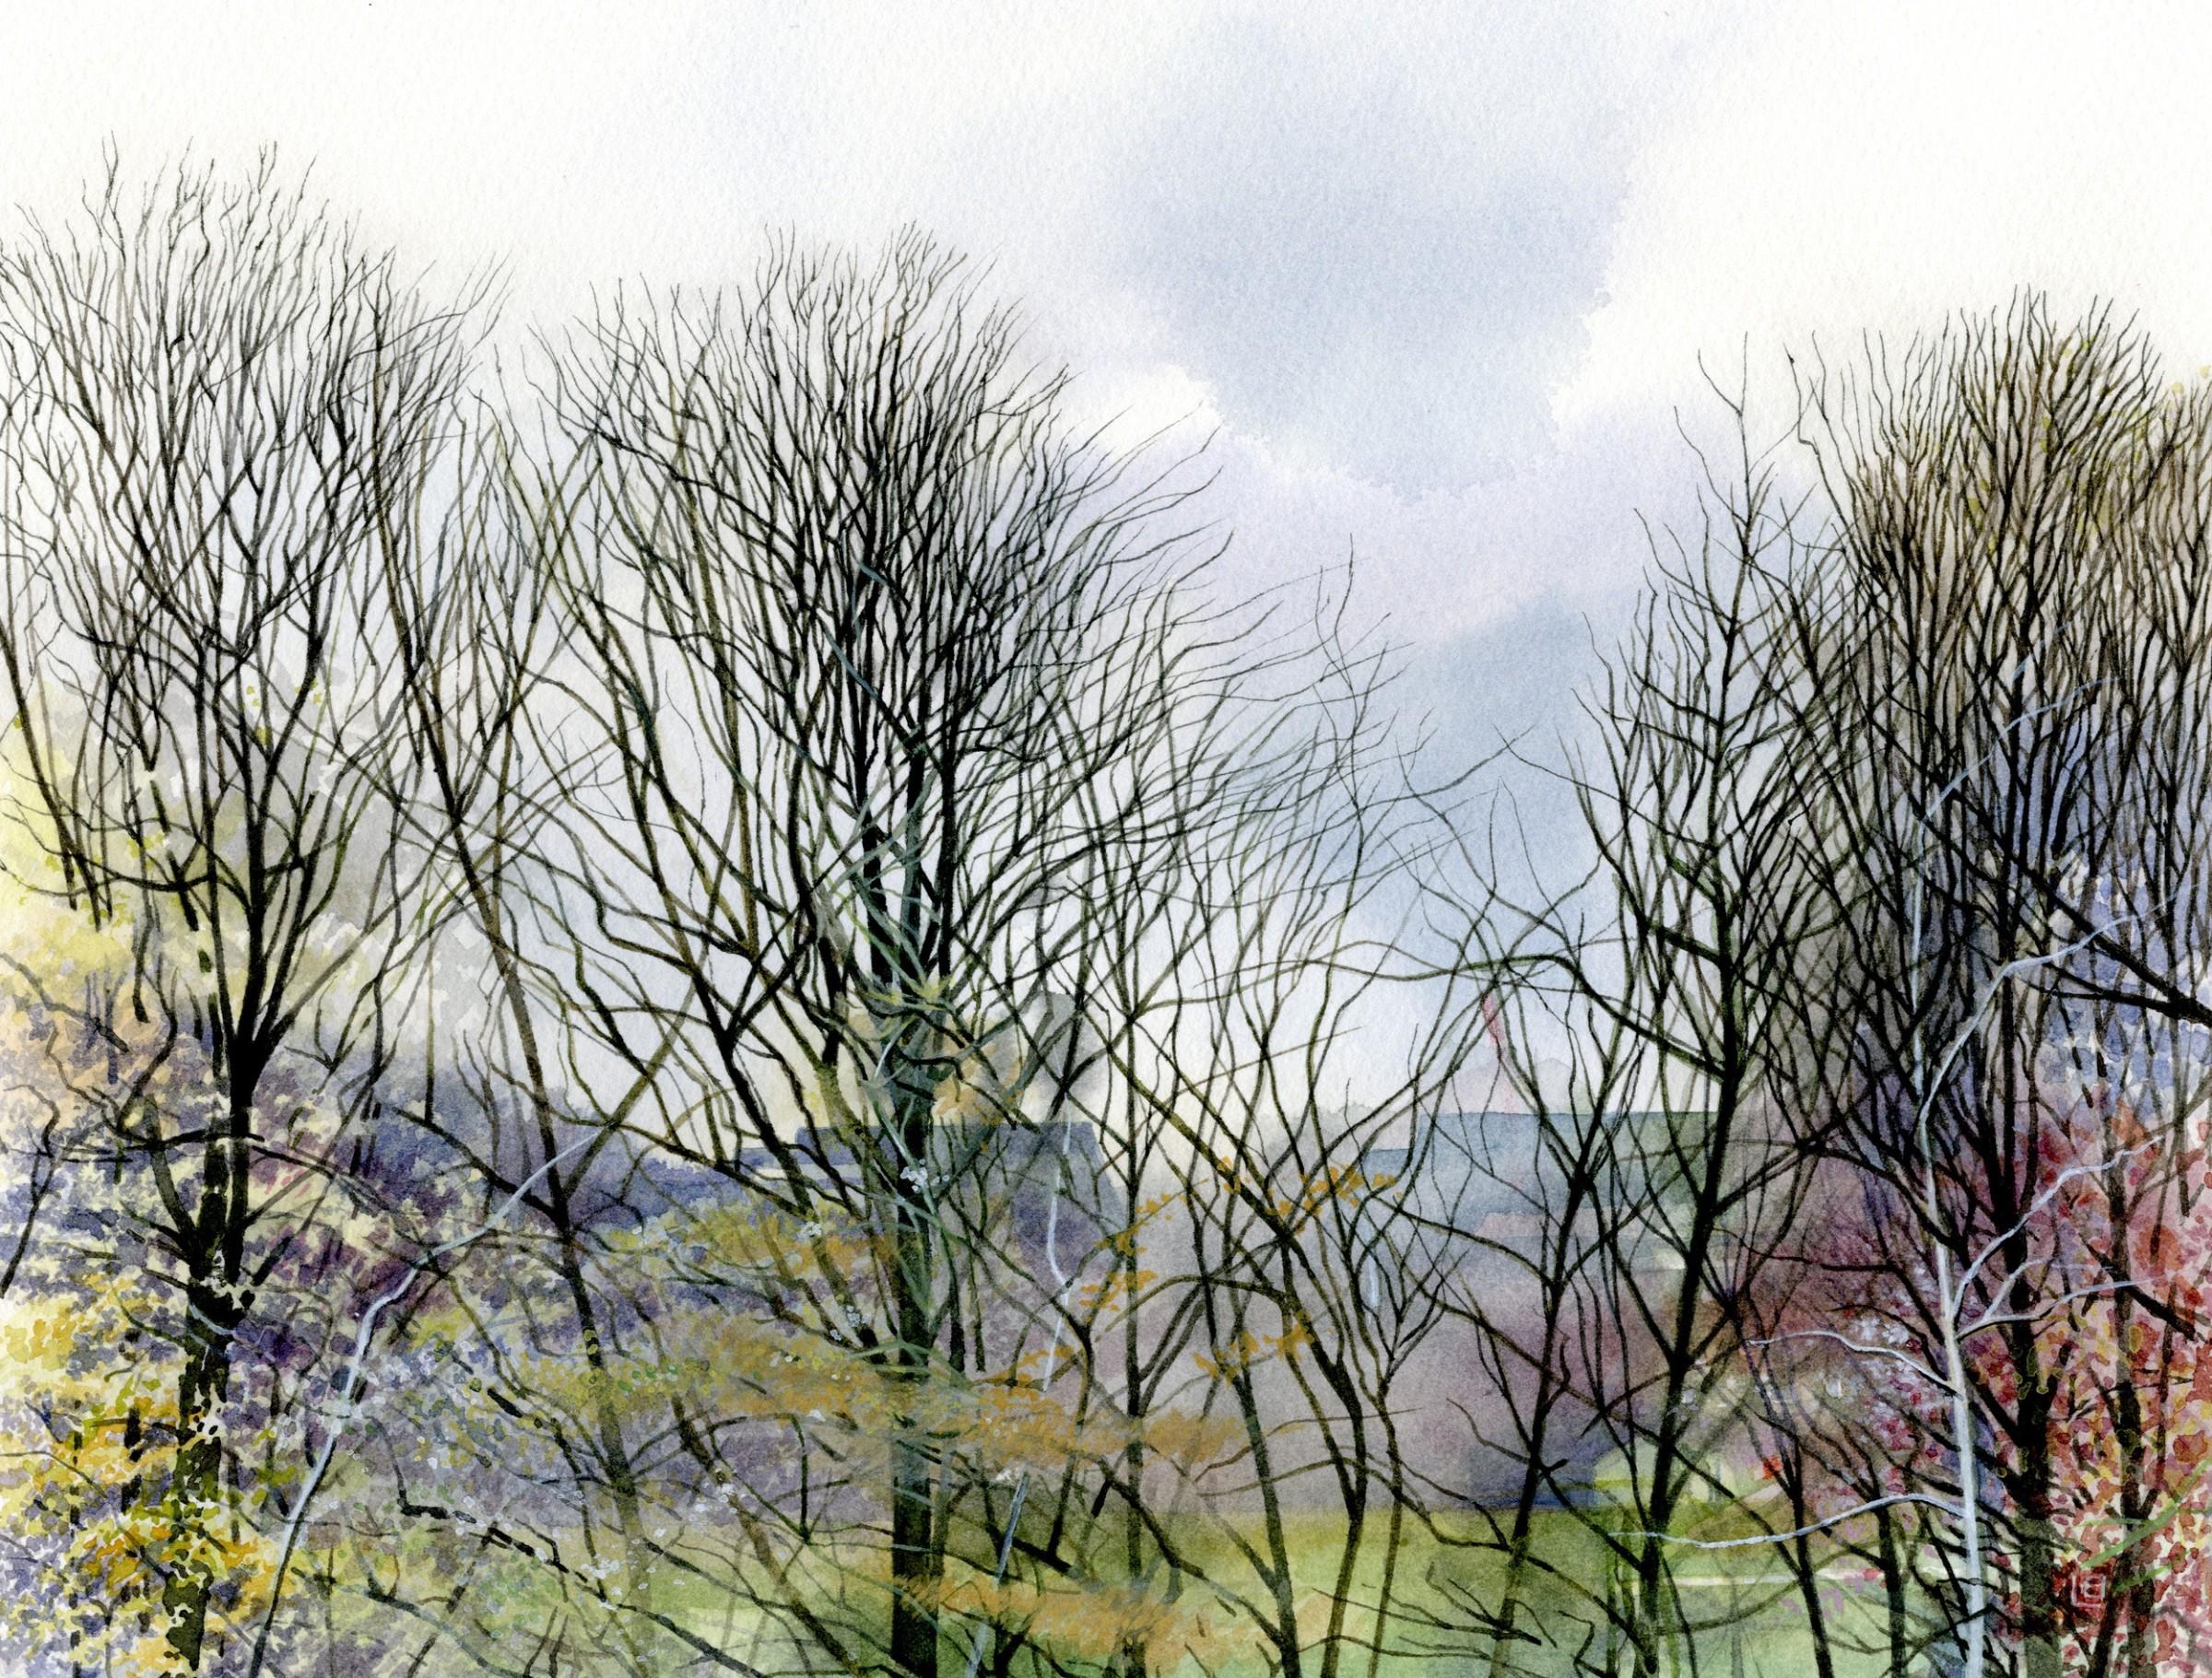 "<span class=""link fancybox-details-link""><a href=""/artists/25-liz-butler/works/12358-liz-butler-the-park-trees-in-march/"">View Detail Page</a></span><div class=""artist""><span class=""artist""><strong>Liz Butler</strong></span></div><div class=""title""><em>The Park Trees in March</em></div><div class=""medium"">watercolour</div><div class=""dimensions"">Frame: 21 x 28 cm<br /> Artwork: 30 x 40 cm</div><div class=""price"">£1,250.00</div>"